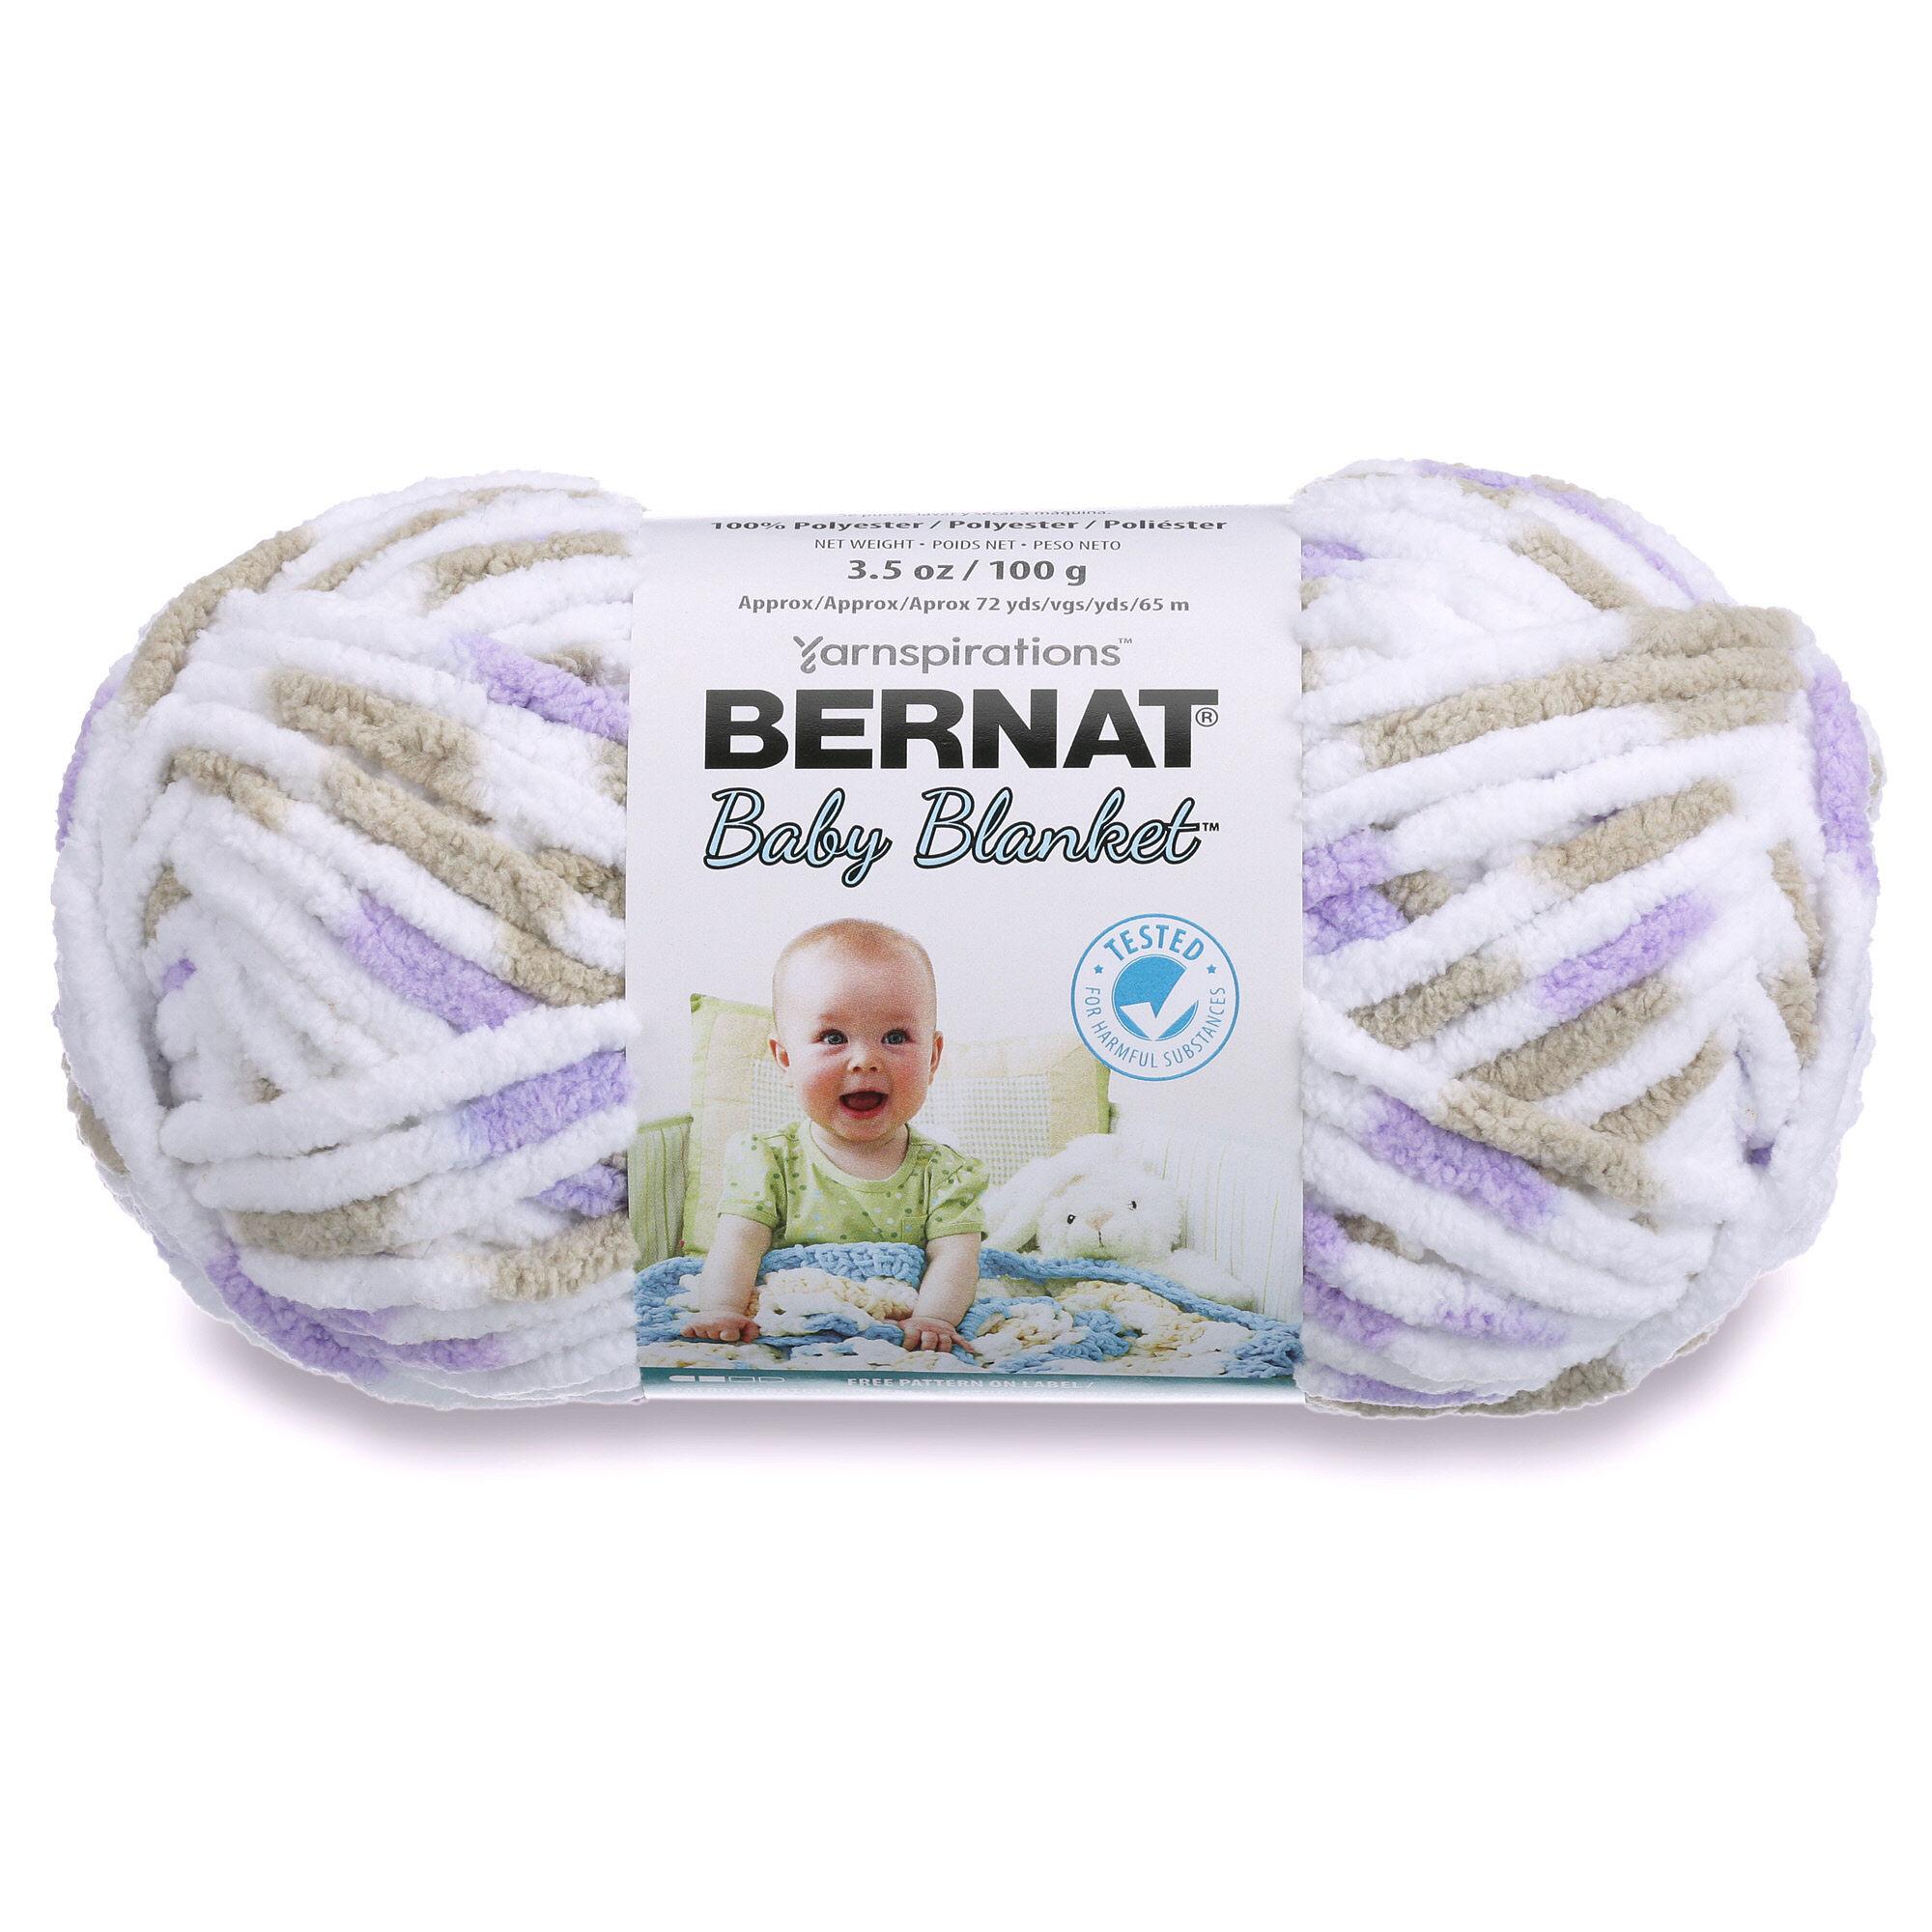 Bernat Baby Blanket Yarn (100g/3 5 oz), Little Lilac Dove